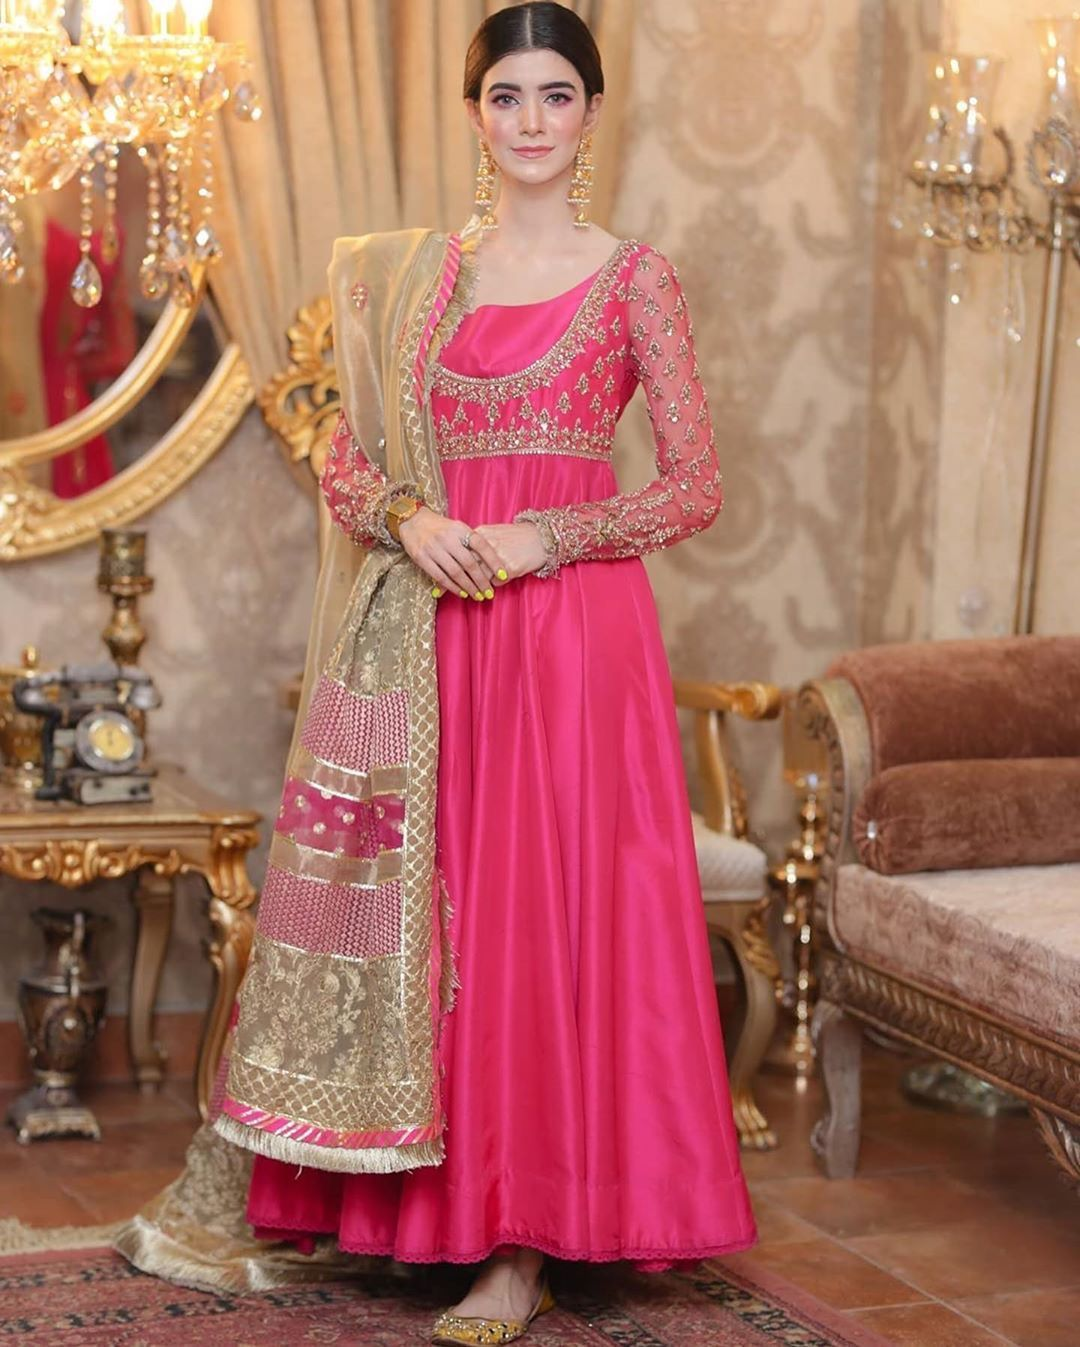 Dulha & Dulhan on Instagram: I love #pink and #peshwas ️